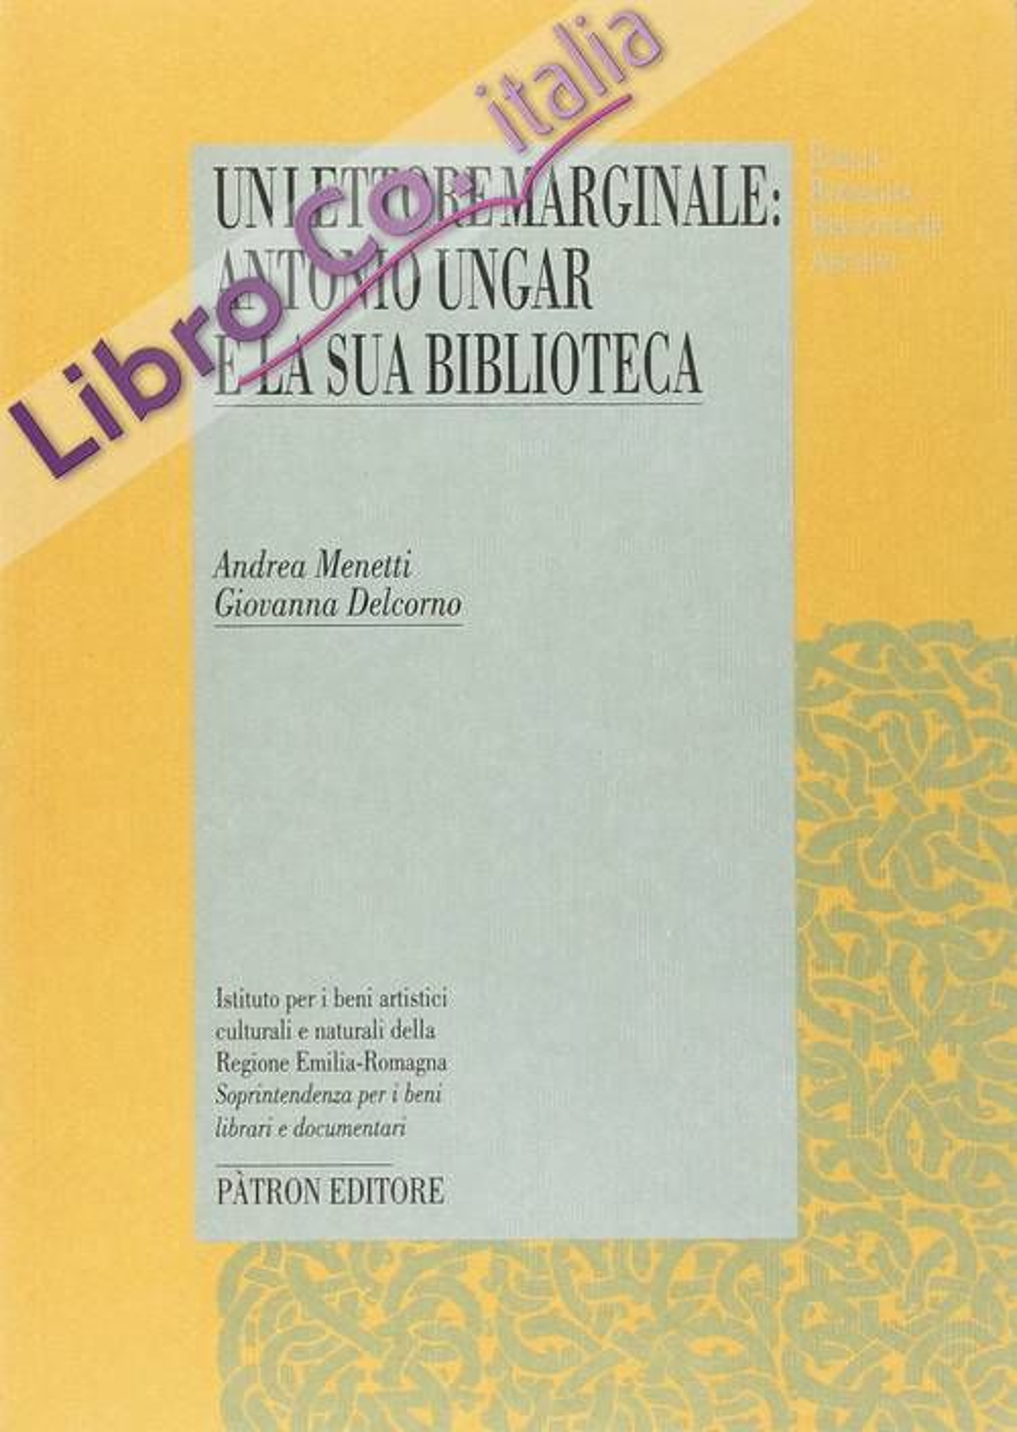 Un lettore marginale: Antonio Ungar e la sua biblioteca.